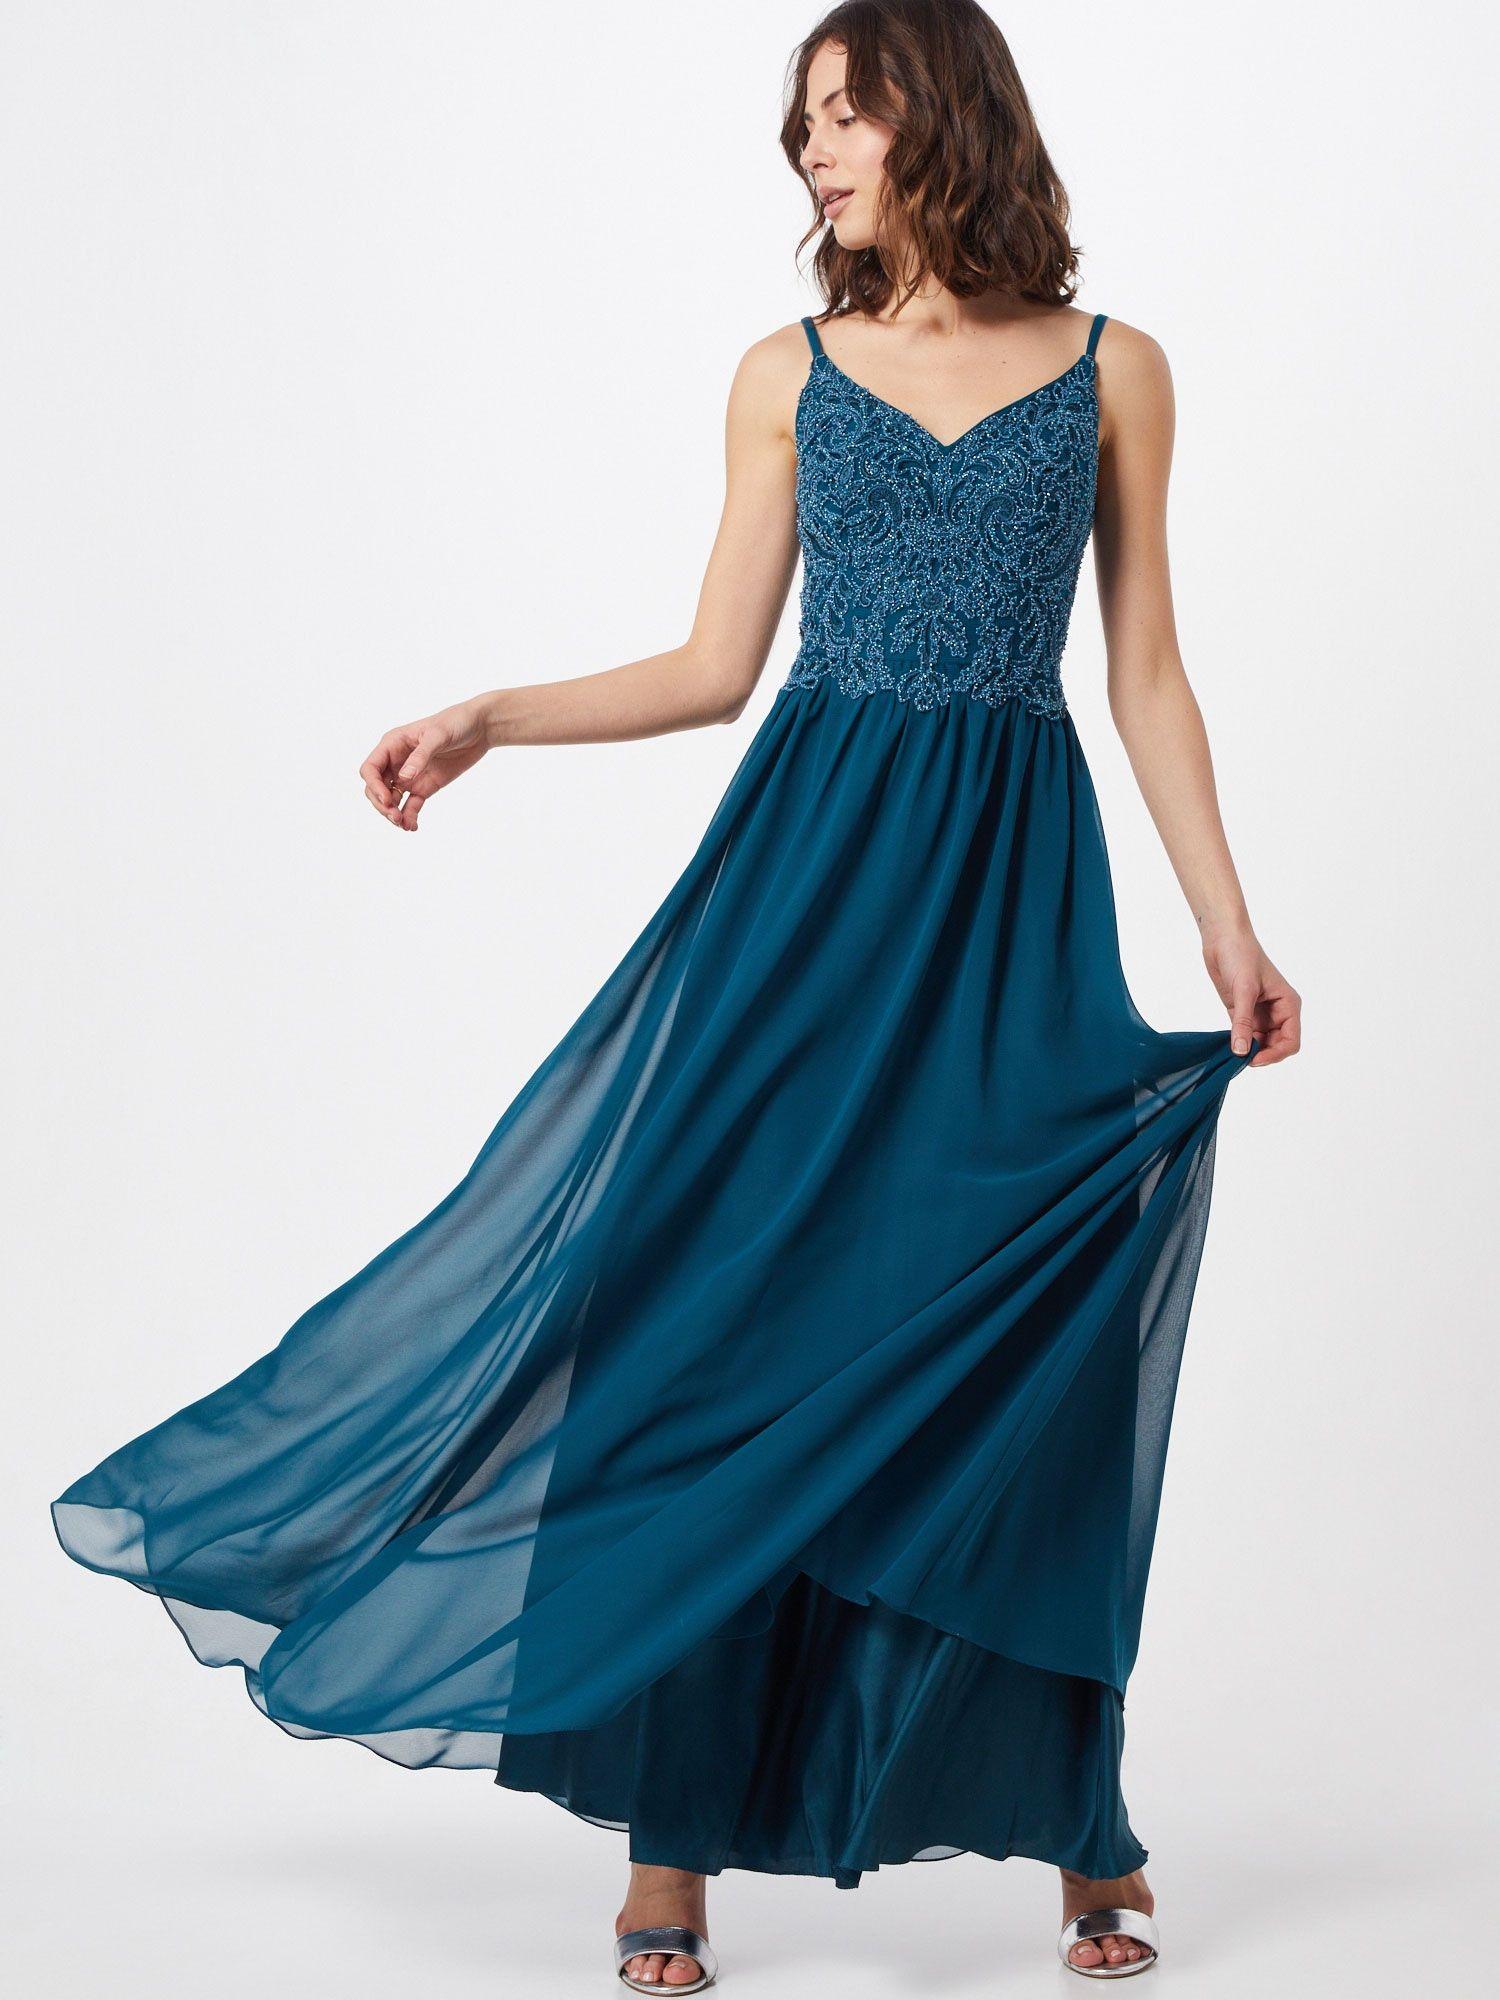 laona kleid damen, petrol, größe 42   laona kleid, kleider